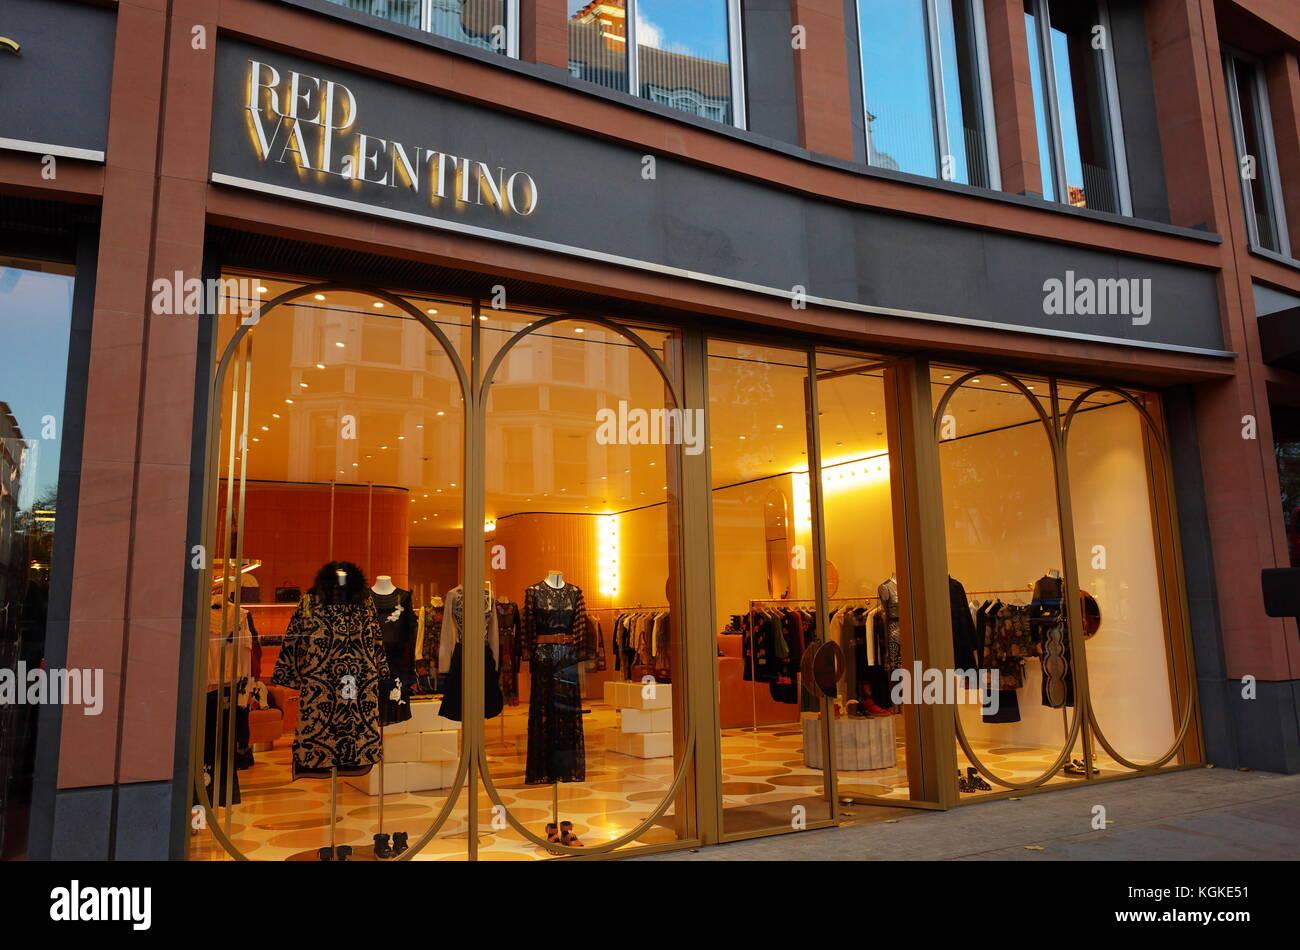 valentino store stock photos valentino store stock. Black Bedroom Furniture Sets. Home Design Ideas